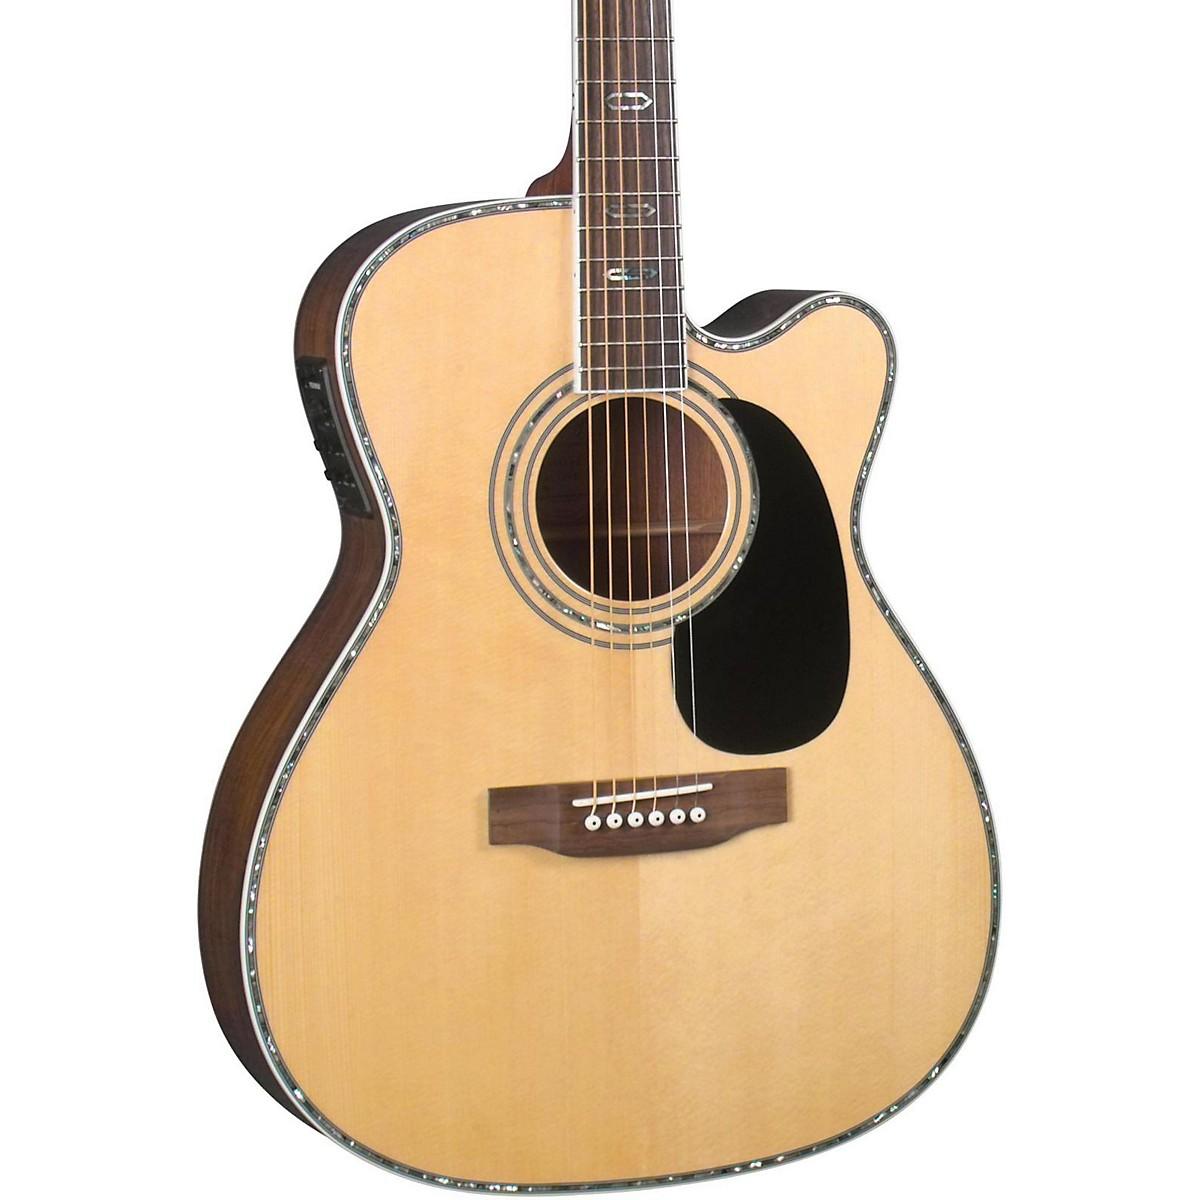 Blueridge Contemporary Series BR-73CE Cutaway 000 Acoustic-Electric Guitar